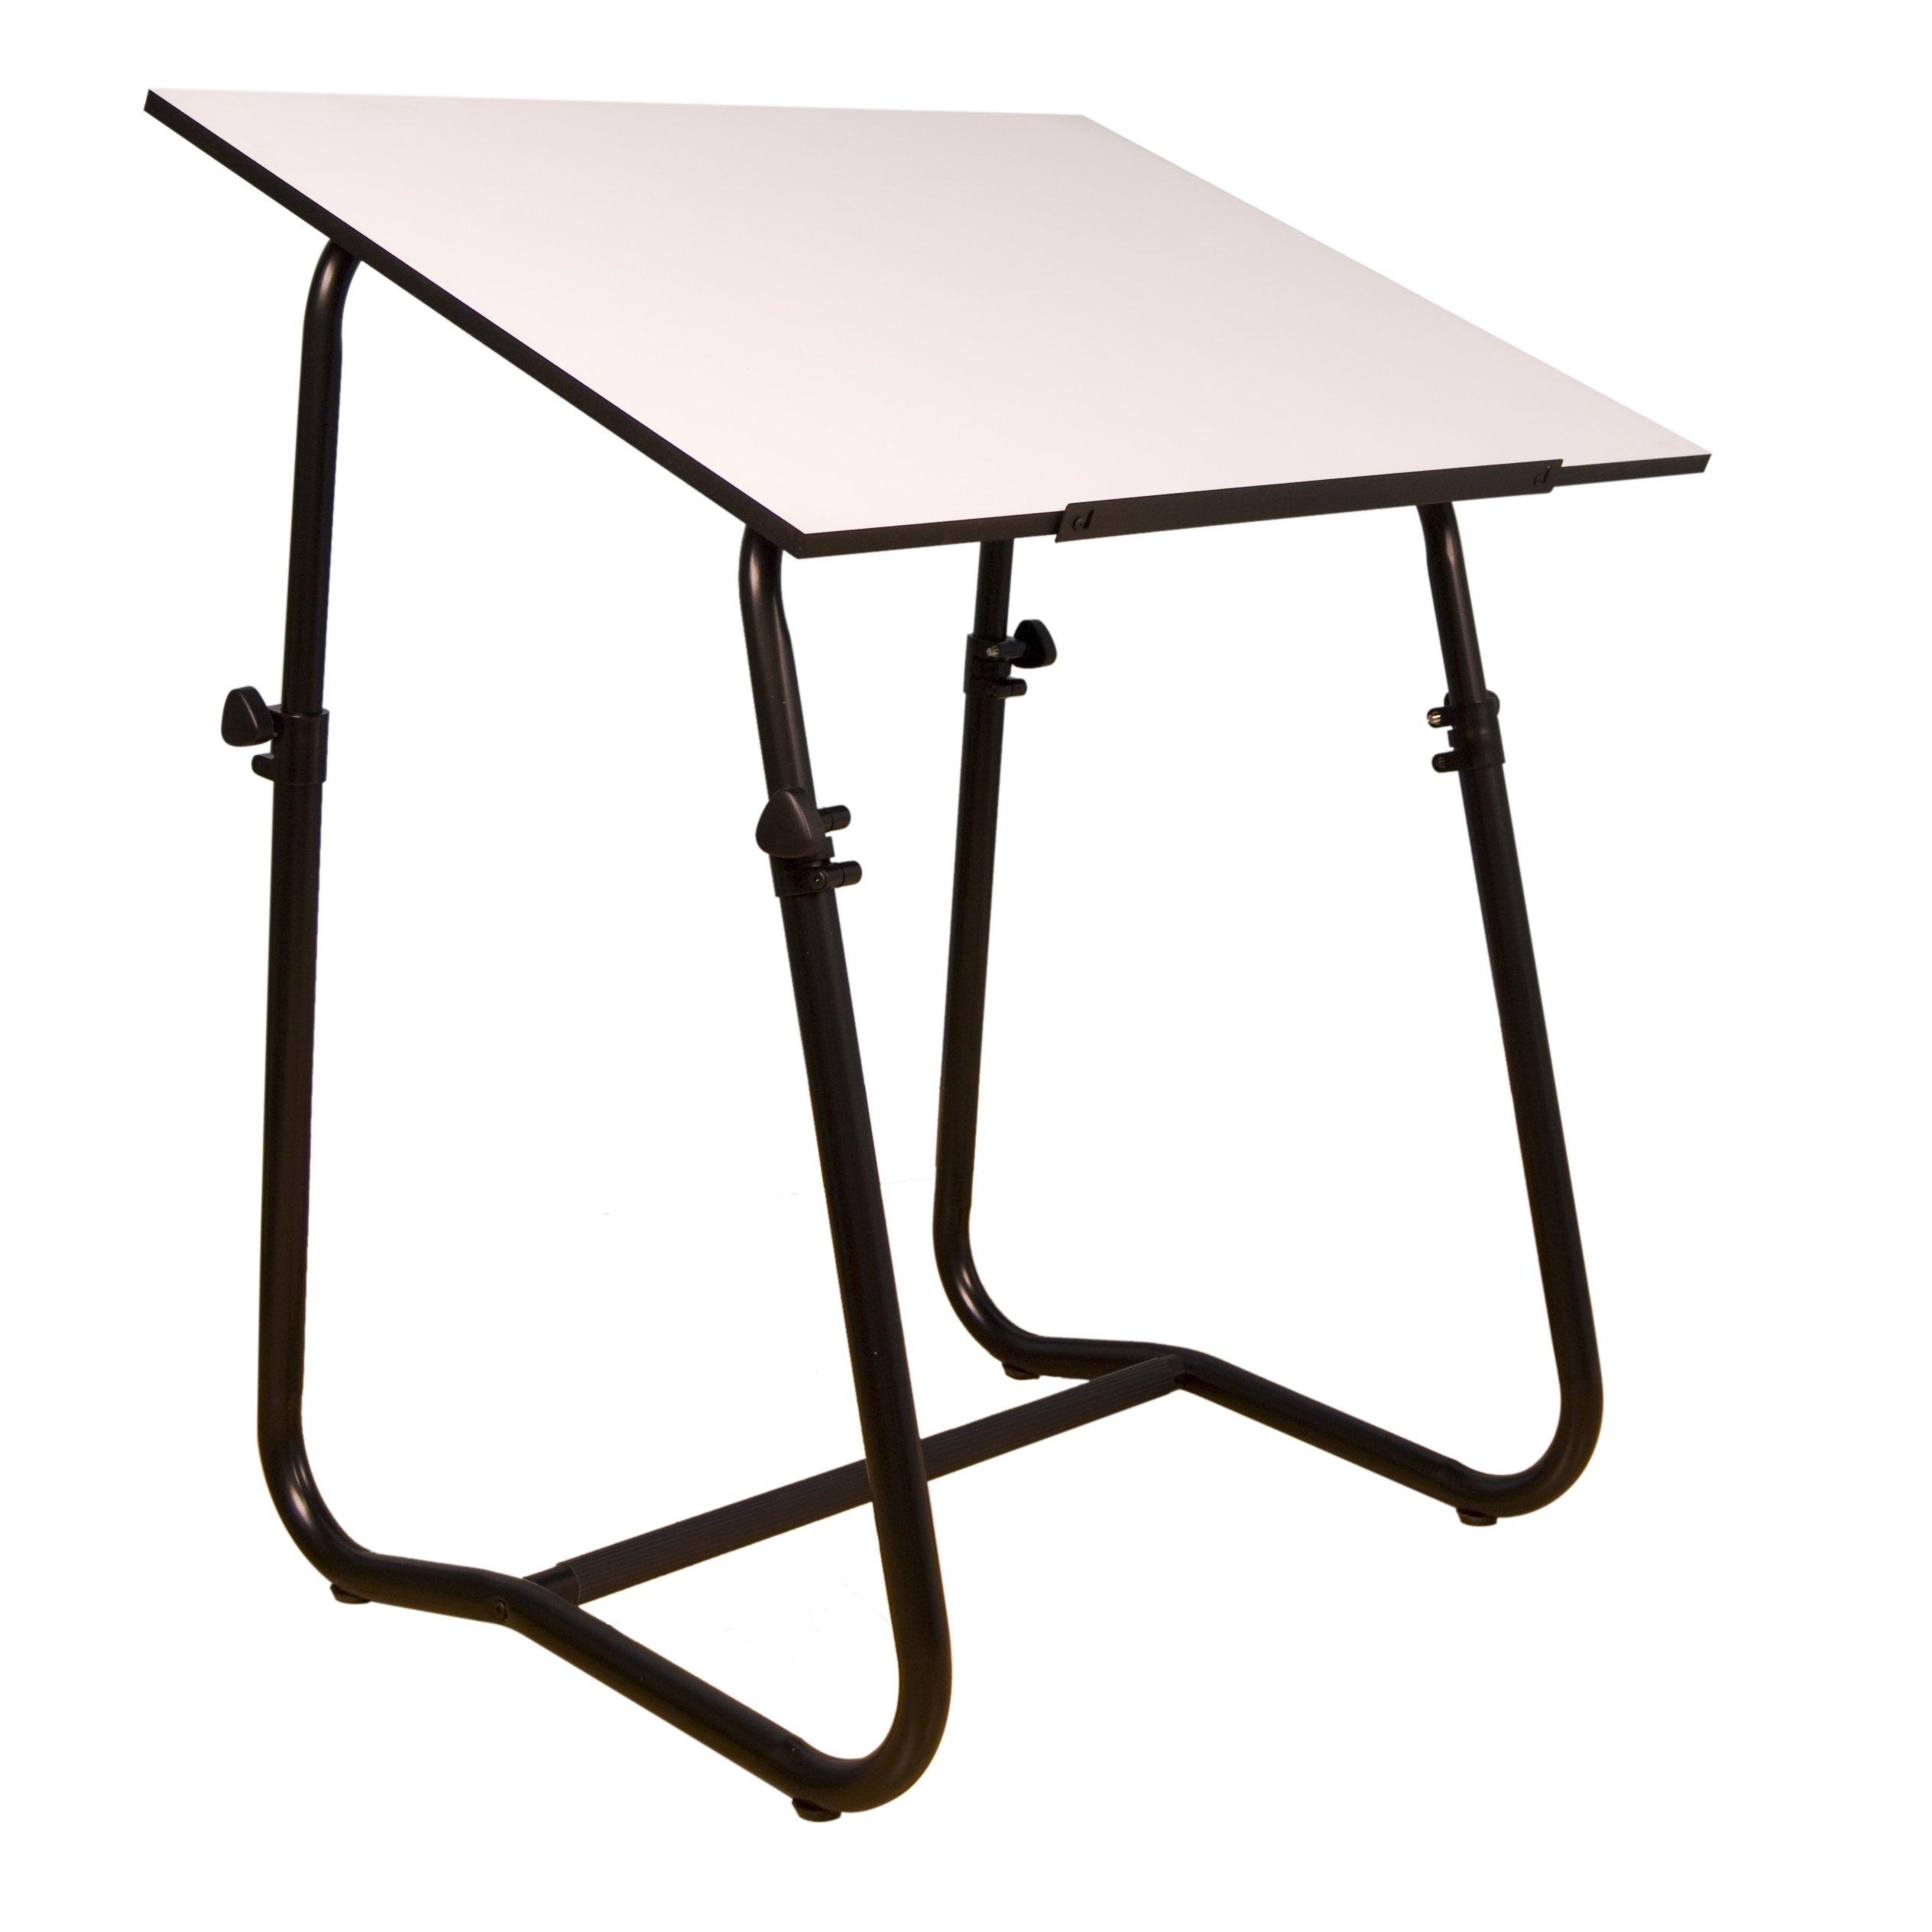 Tech Drafting Table - Black  Base by Studio Designs